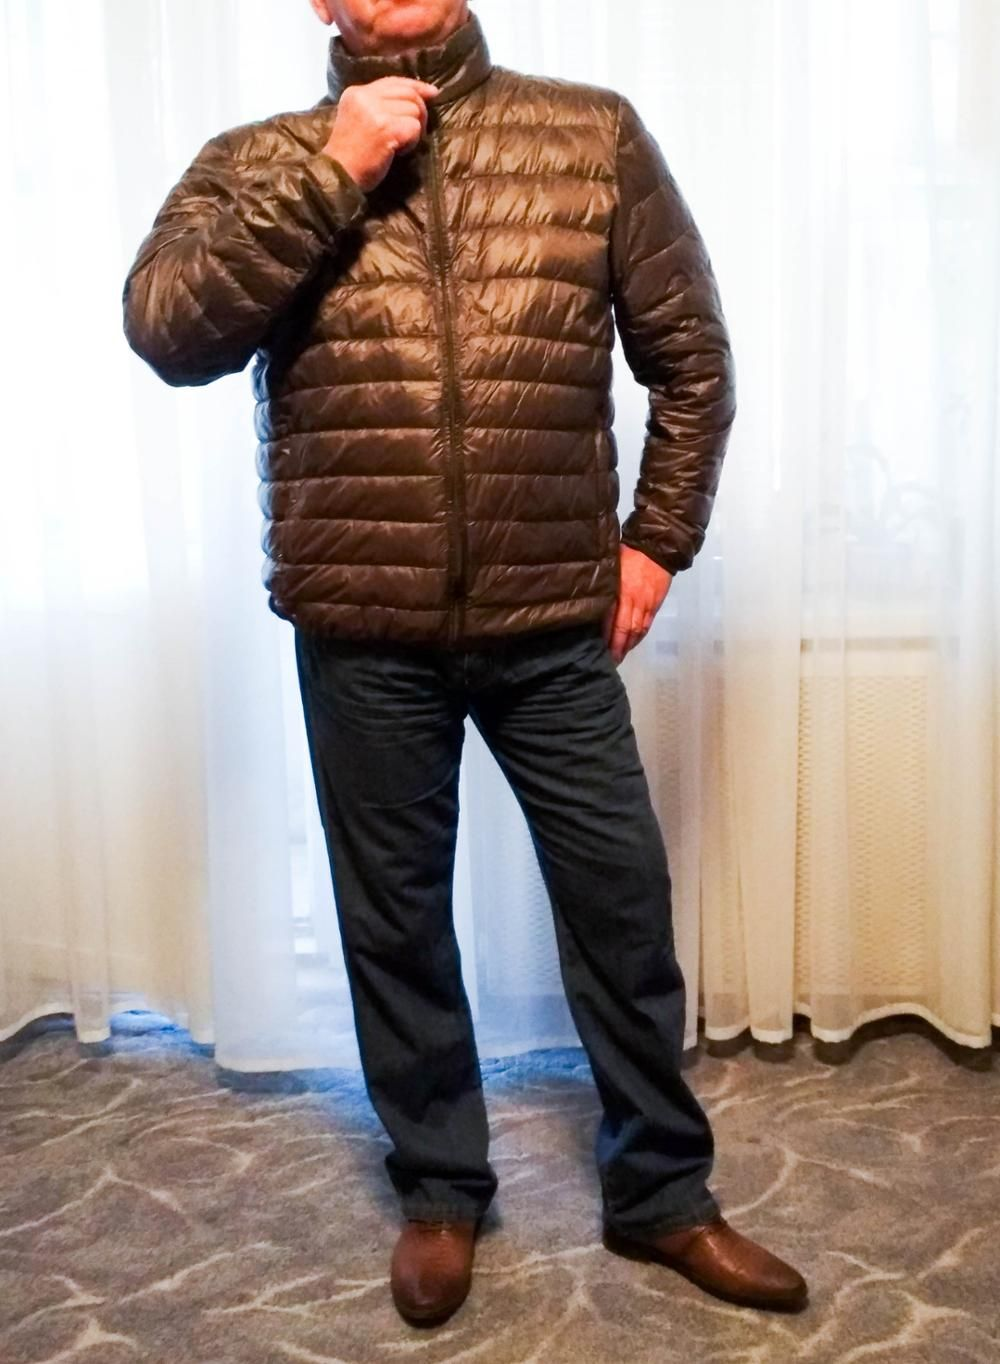 fe9f249c783 New Autumn Winter Man Duck Down Jacket Ultra Light Thin Plus Size Spri -  chicmaxonline